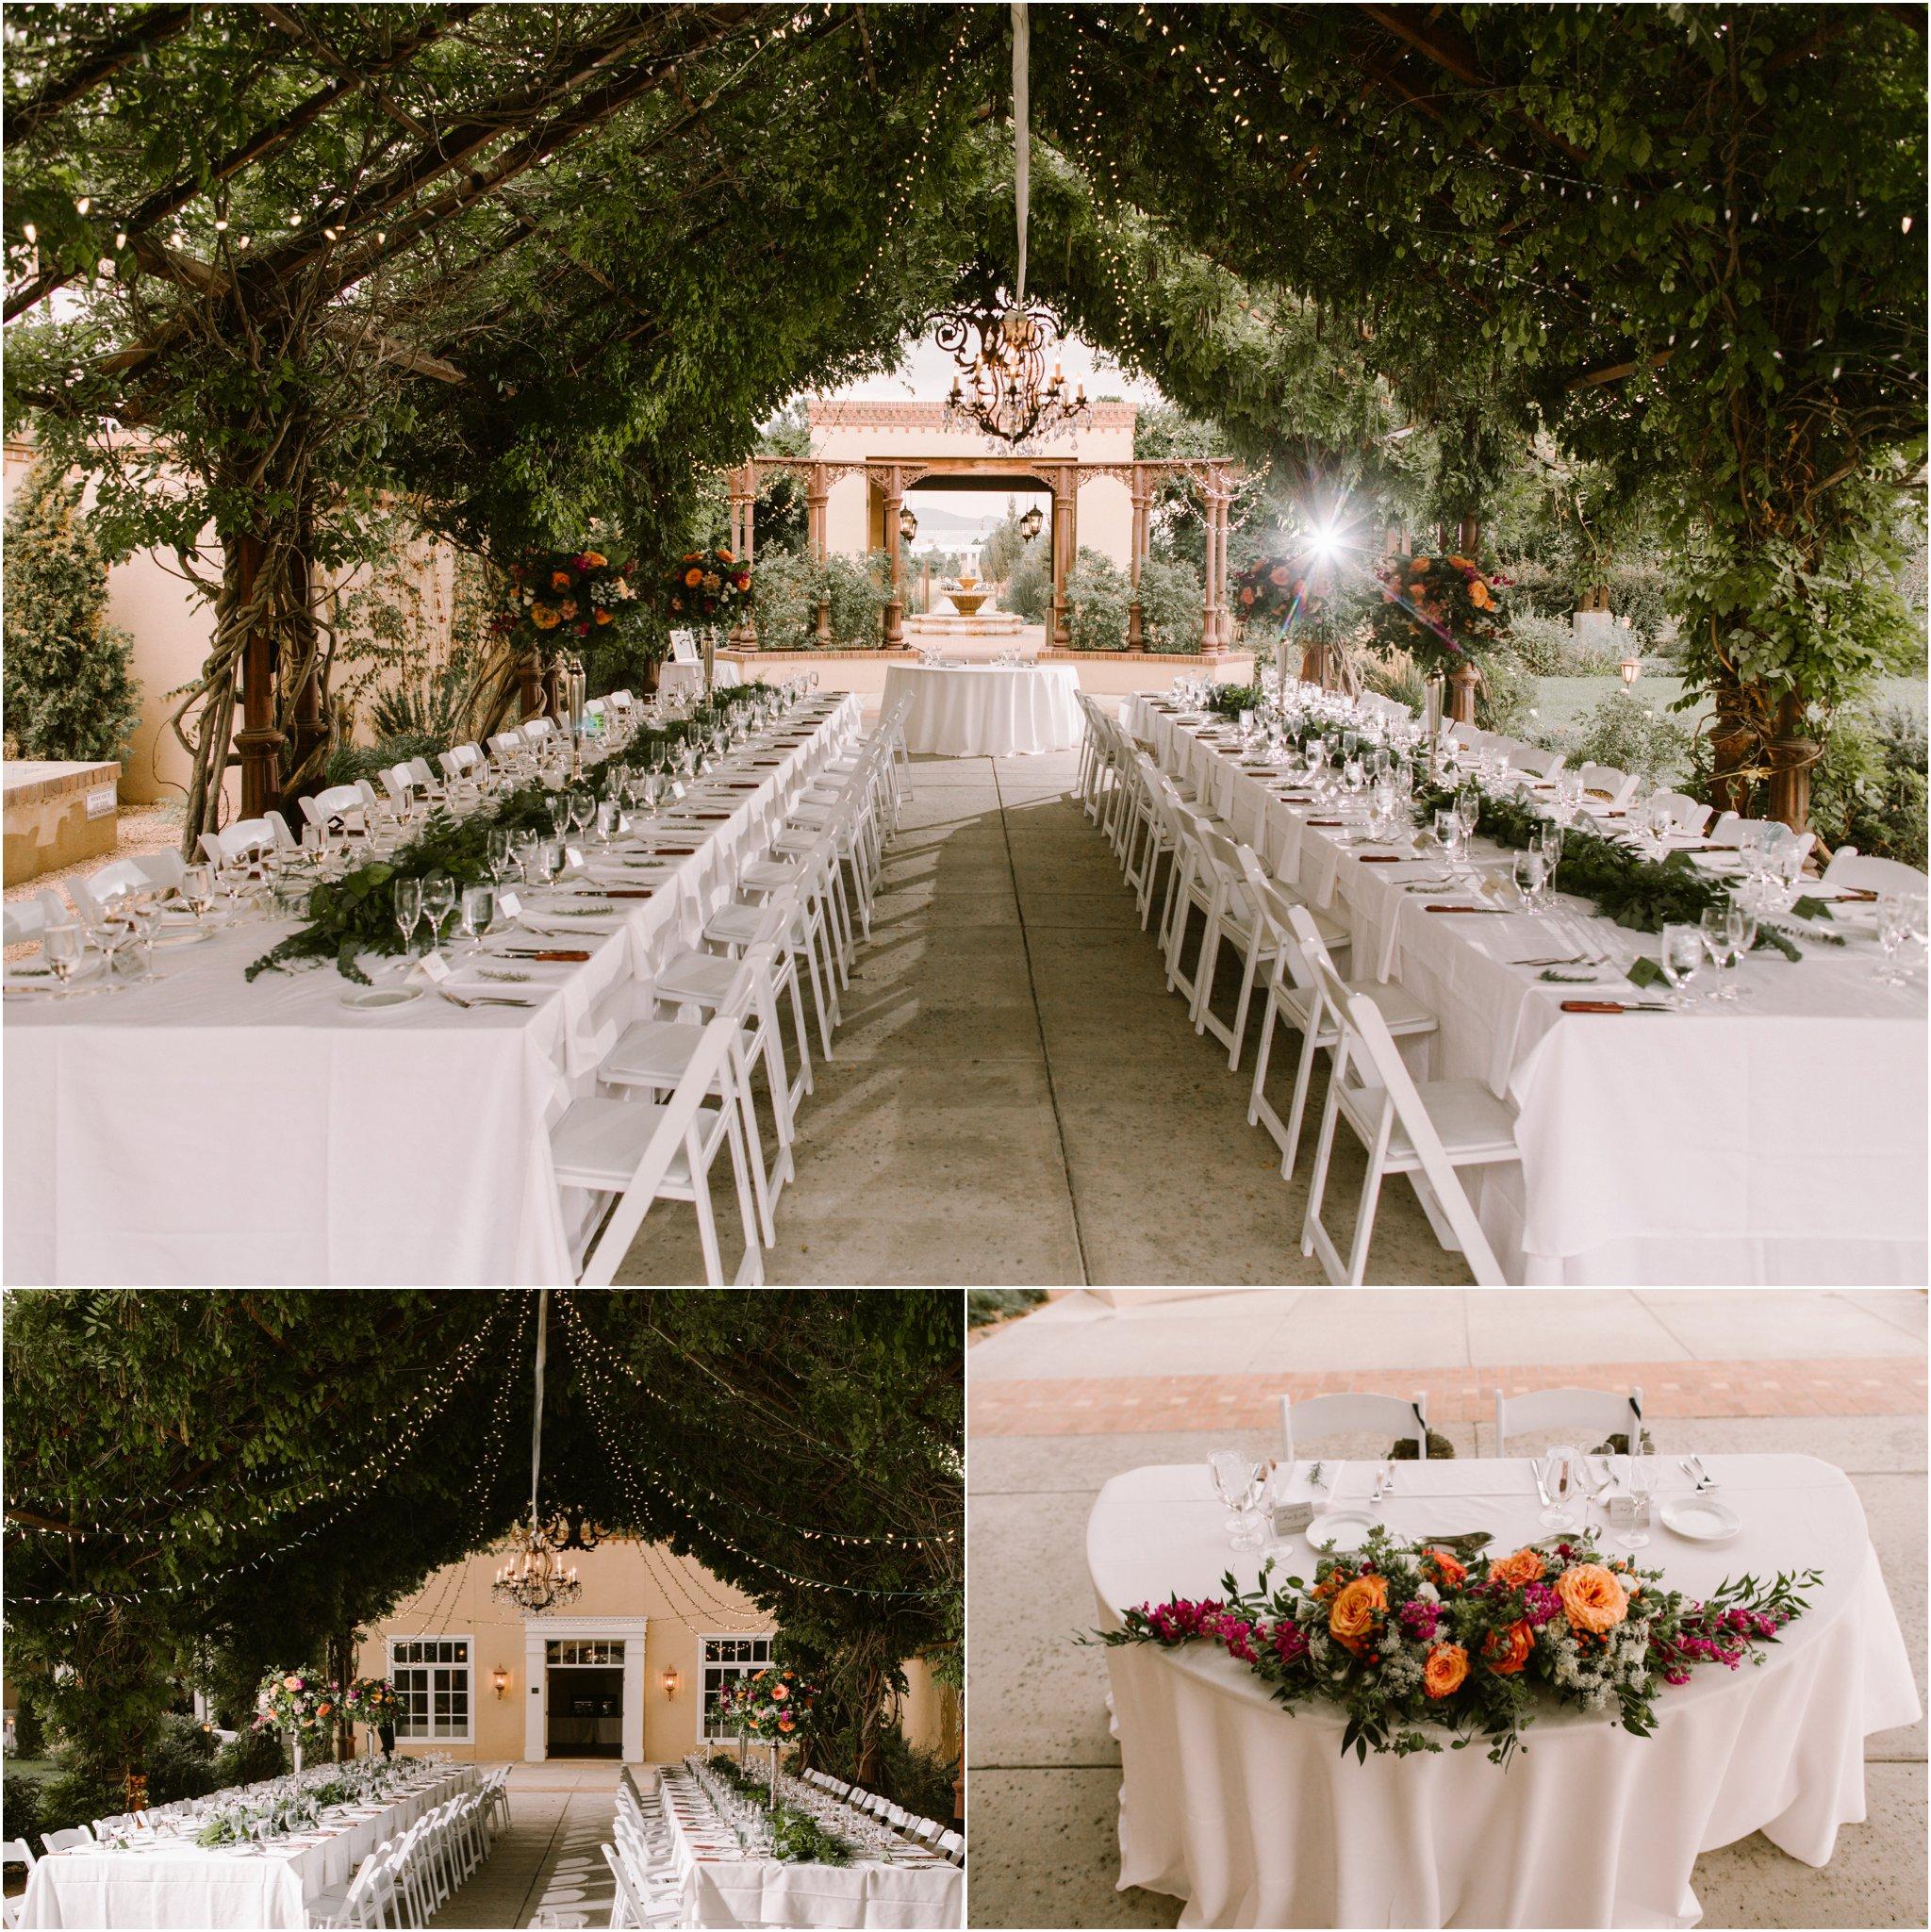 0032Hotel Albuquerque Wedding, Inn and Spa at Loretto wedding, Santa Fe wedding photographers, blue rose photography